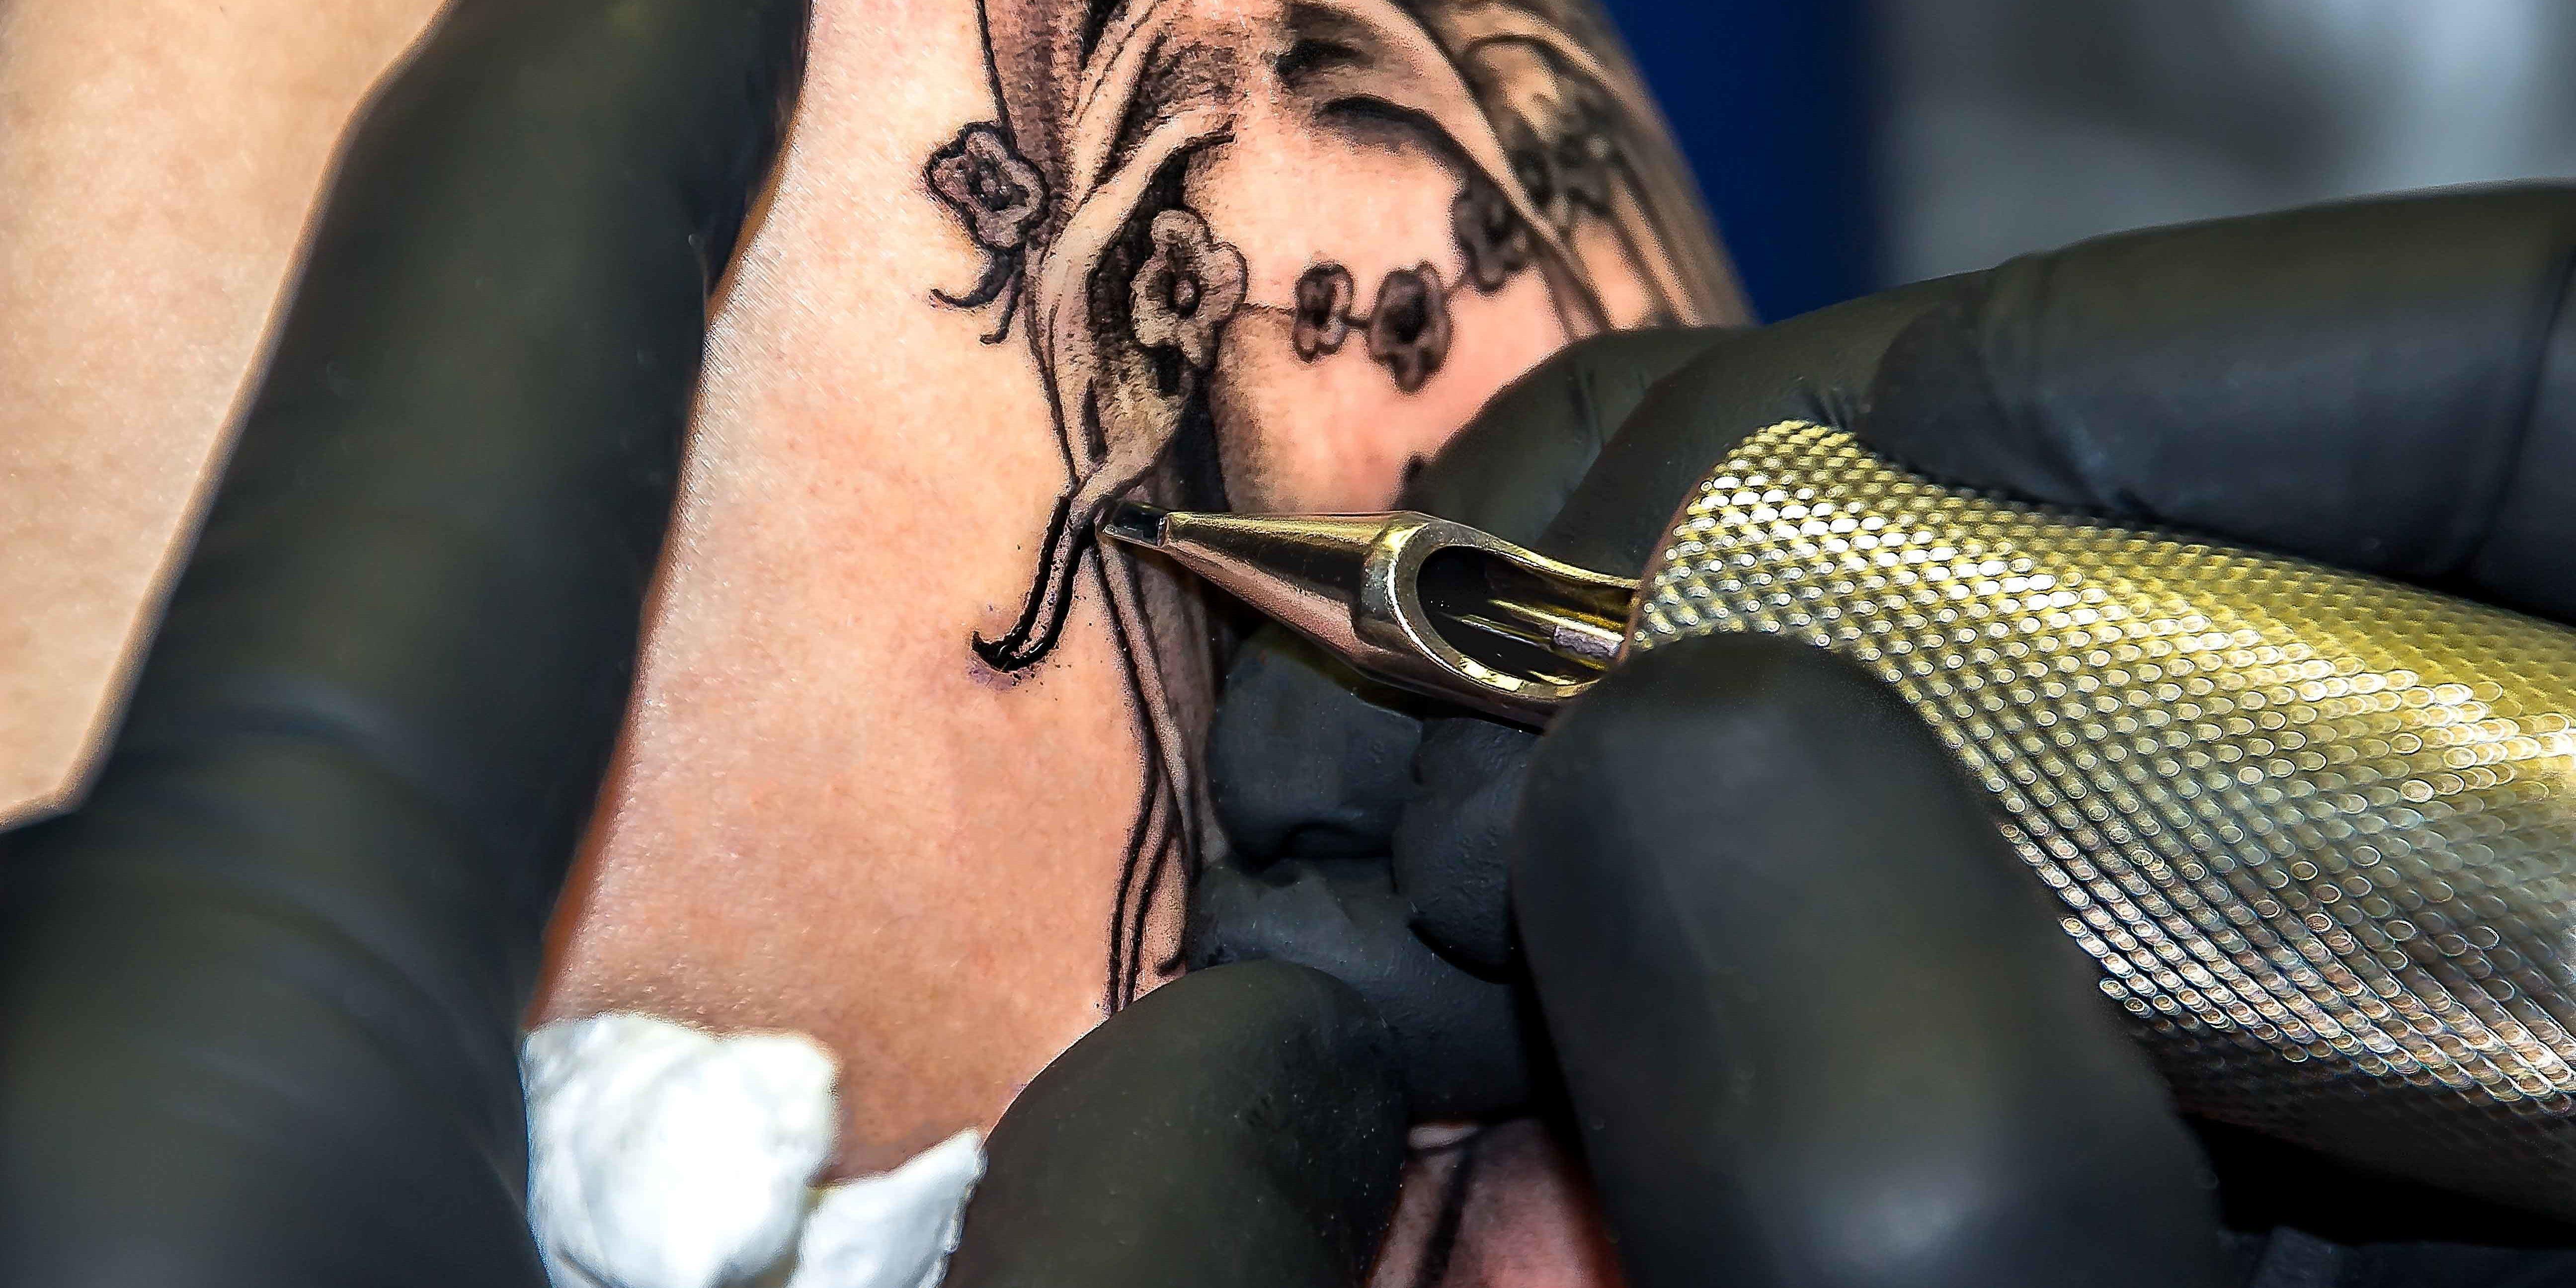 Athletes and tattoos